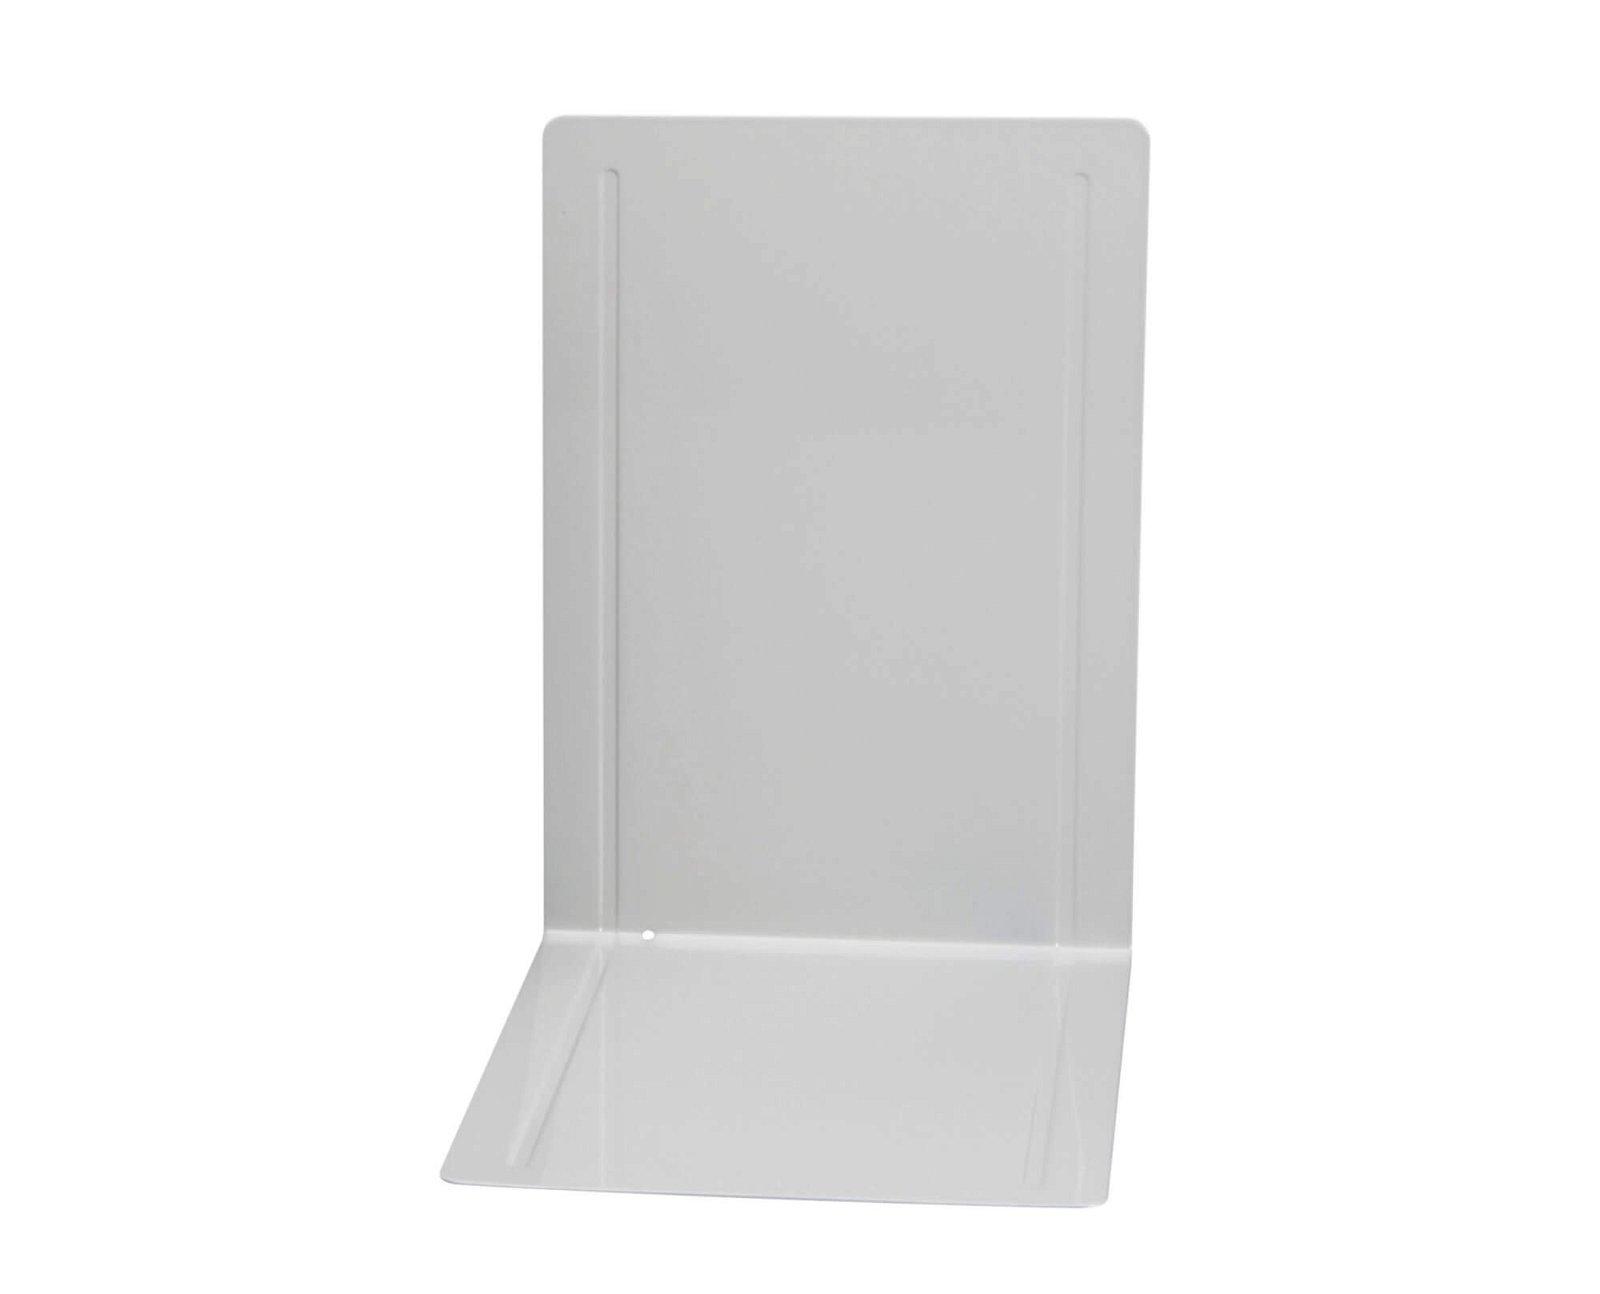 Registraturstützen breit, 24 x 16,8 x 24 cm, grau